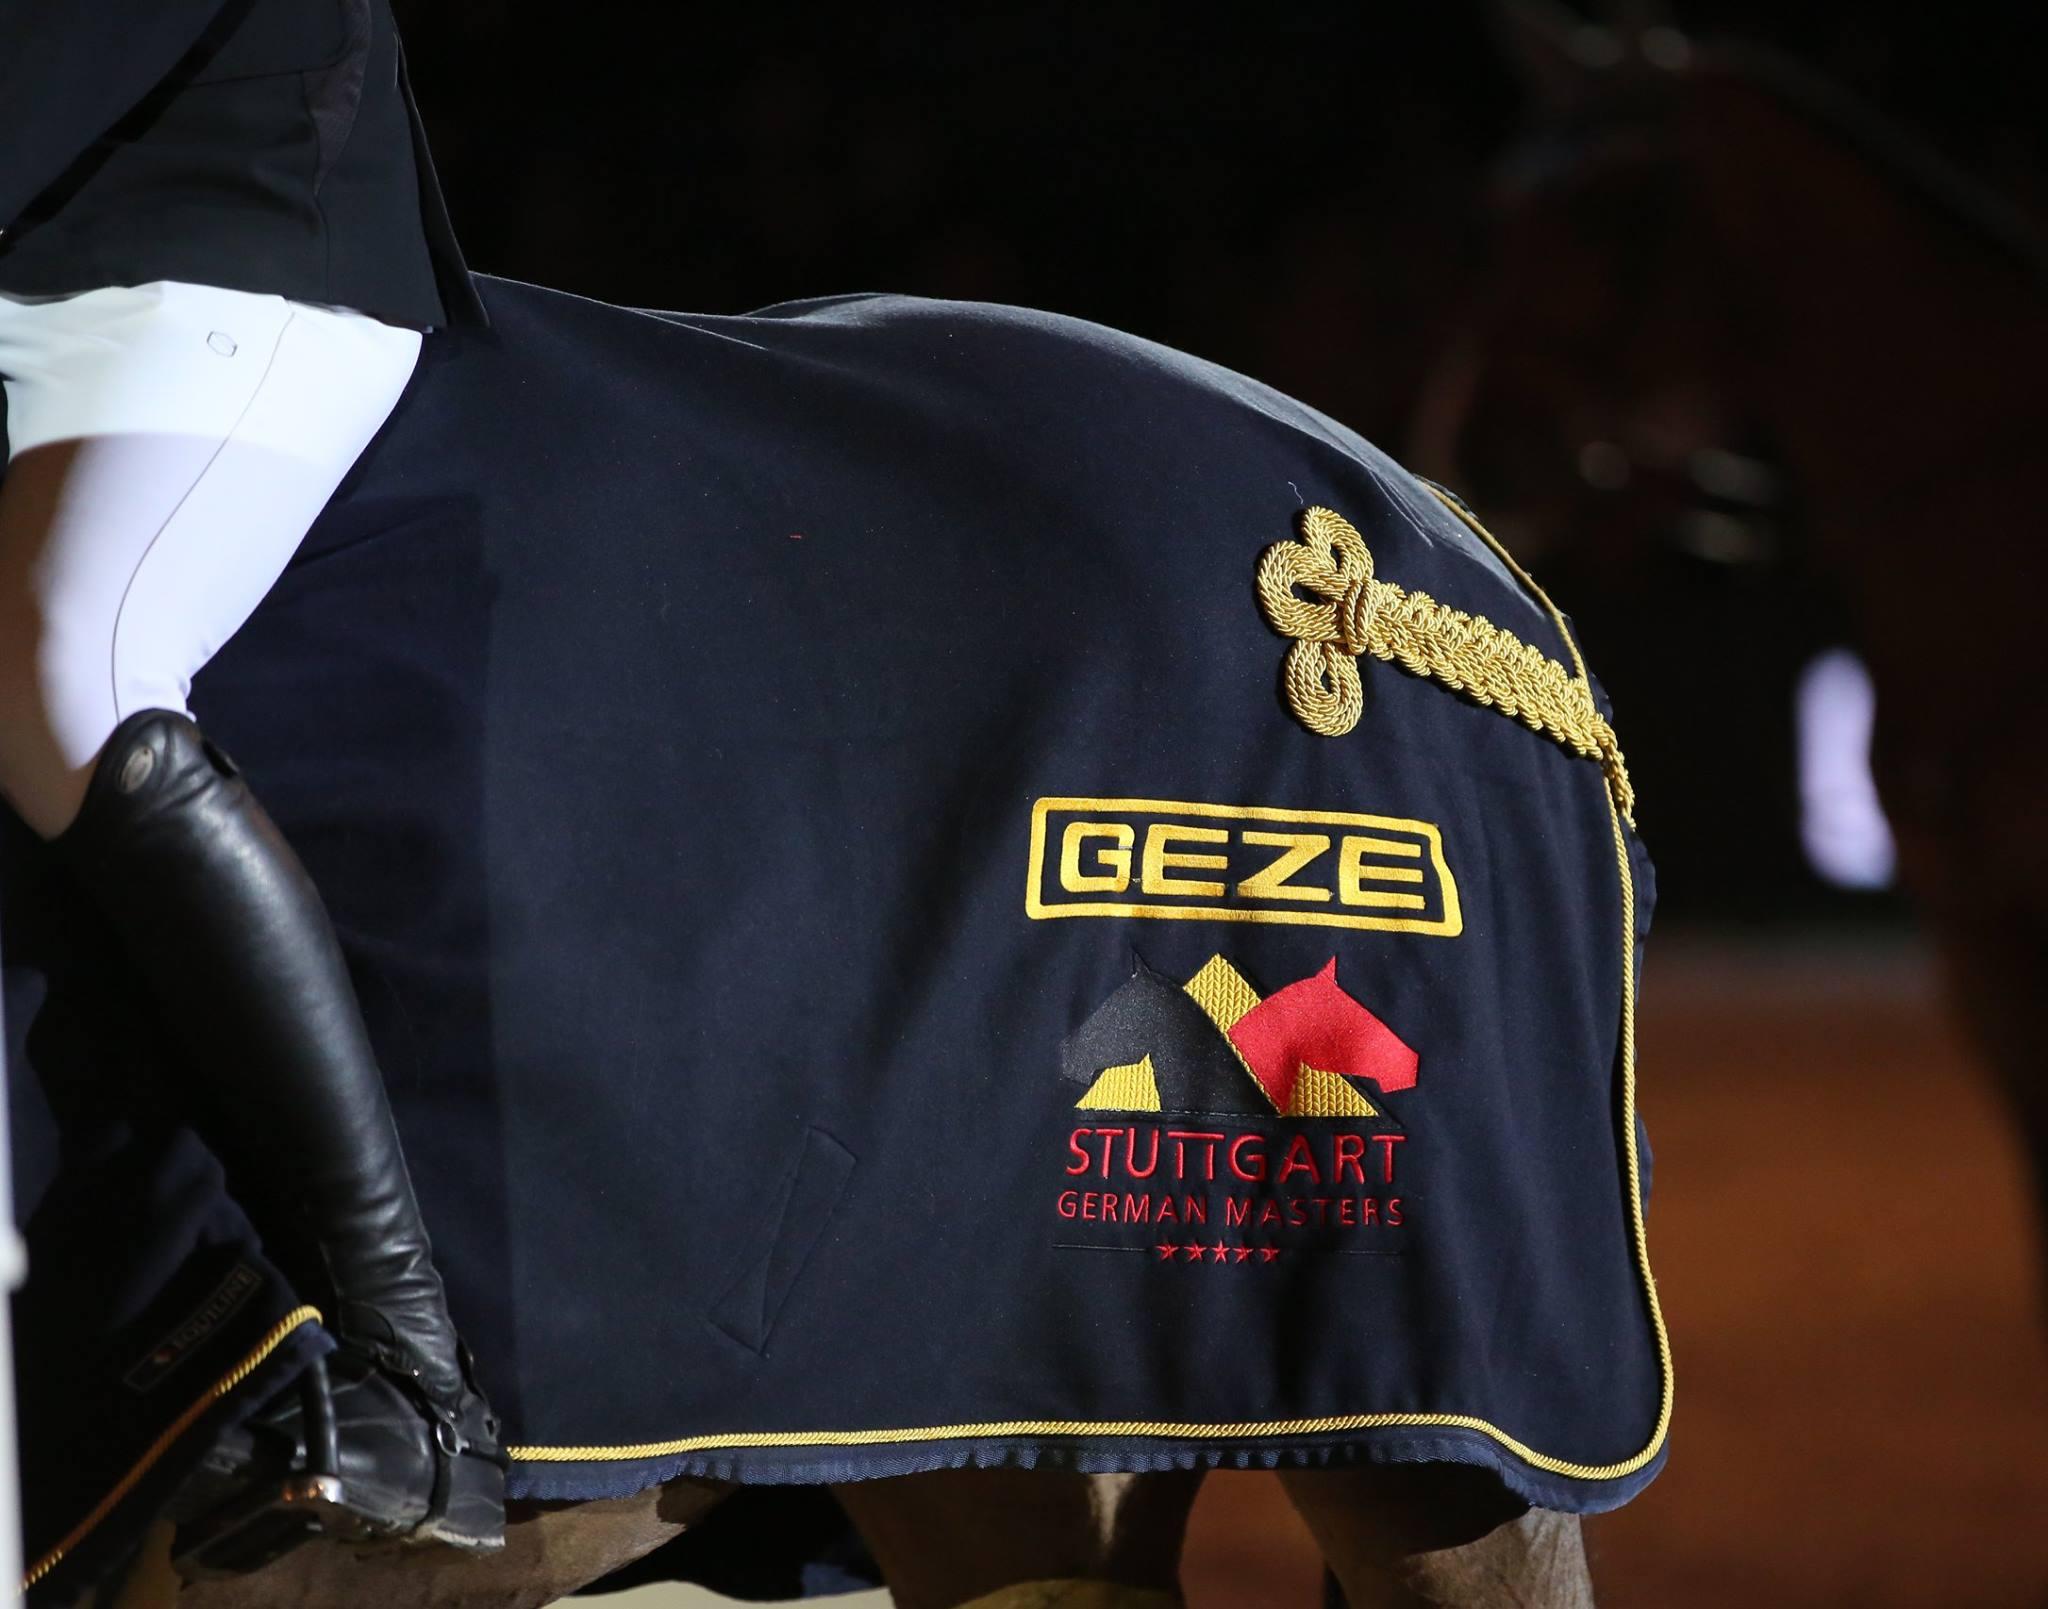 Lorenzo de Luca wins with eternal smile in Stuttgart